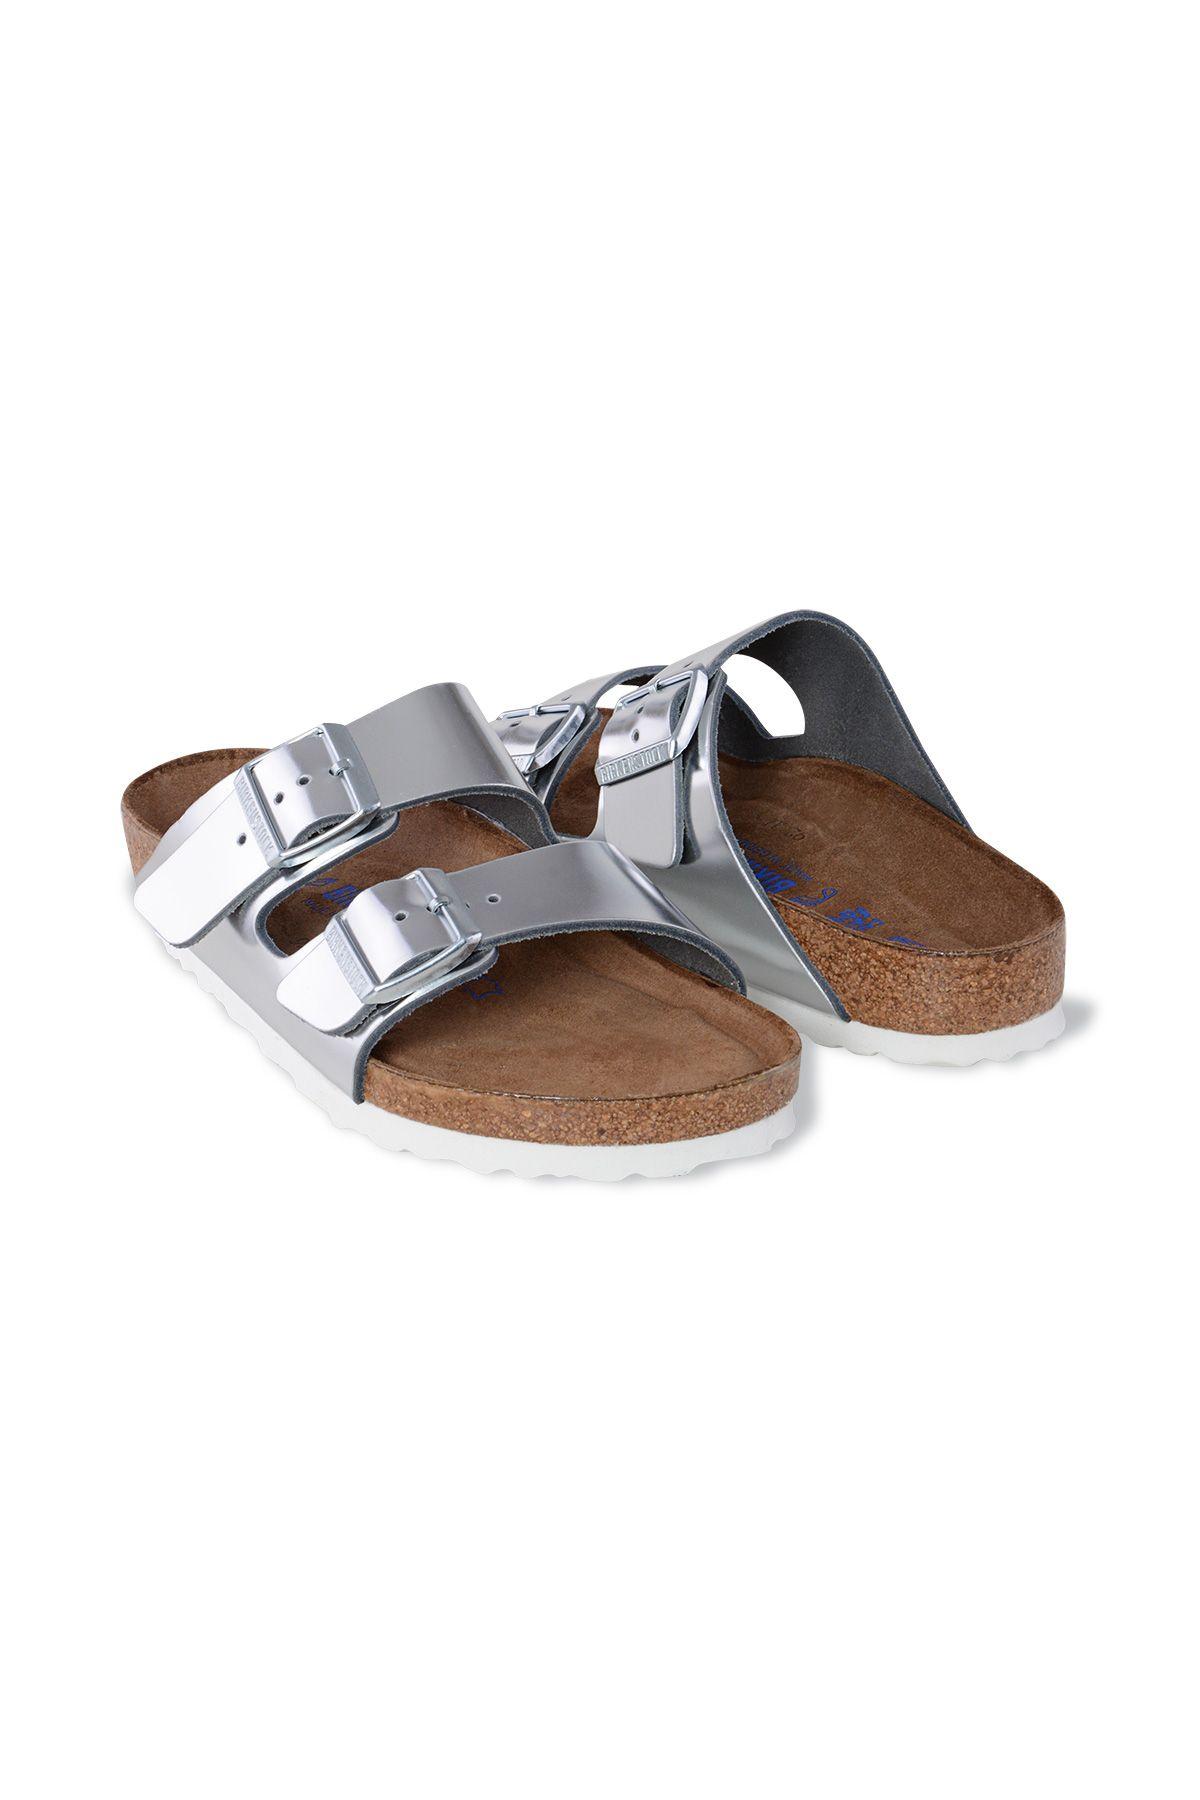 Birkenstock Arizona BS Genuine Leather Women's Summer Slippers 1005960 Silver